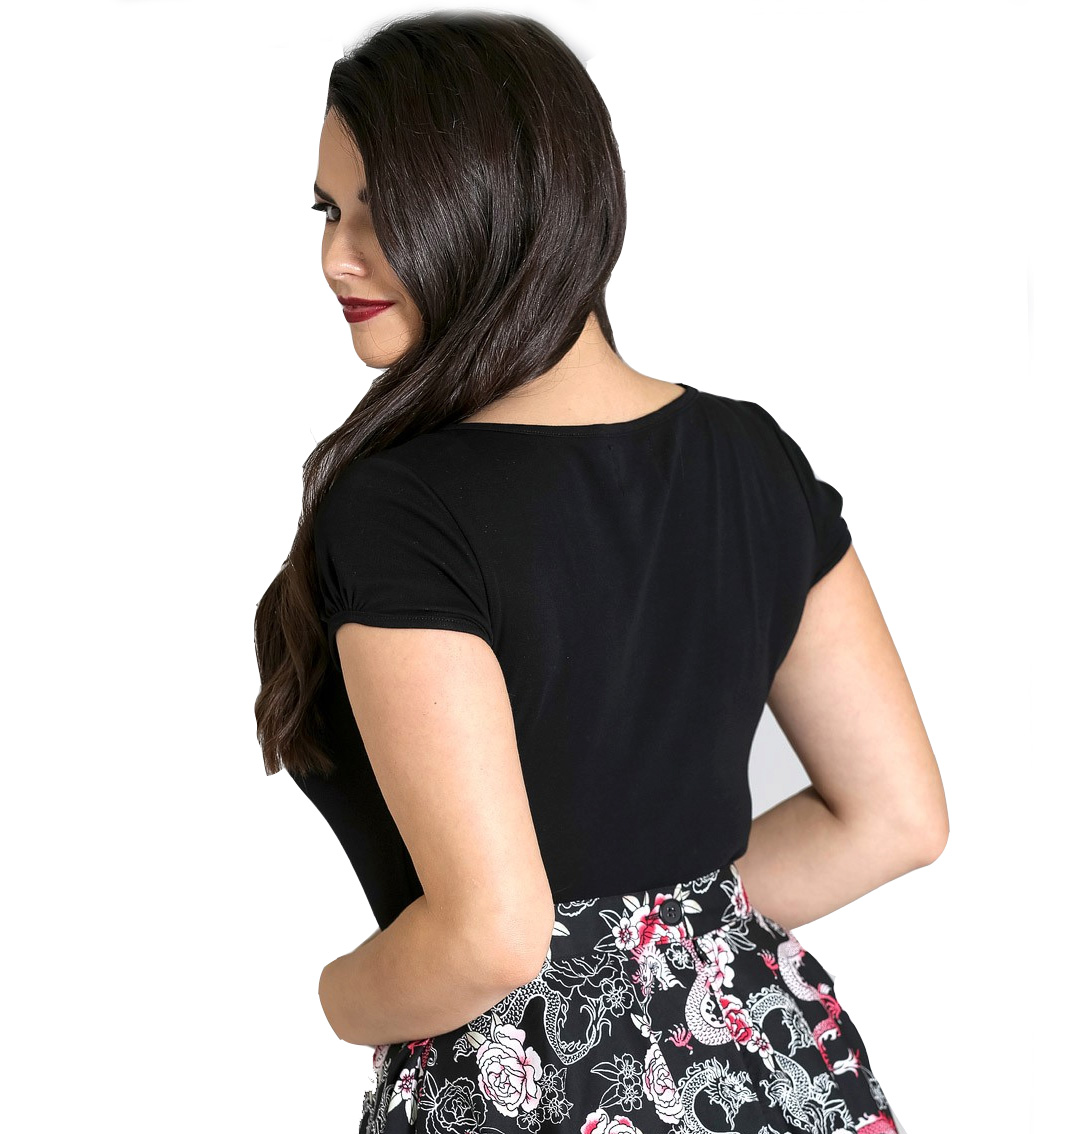 Hell-Bunny-Shirt-50s-Rockabilly-Top-MIA-Plain-Black-Short-Sleeves-All-Sizes thumbnail 23